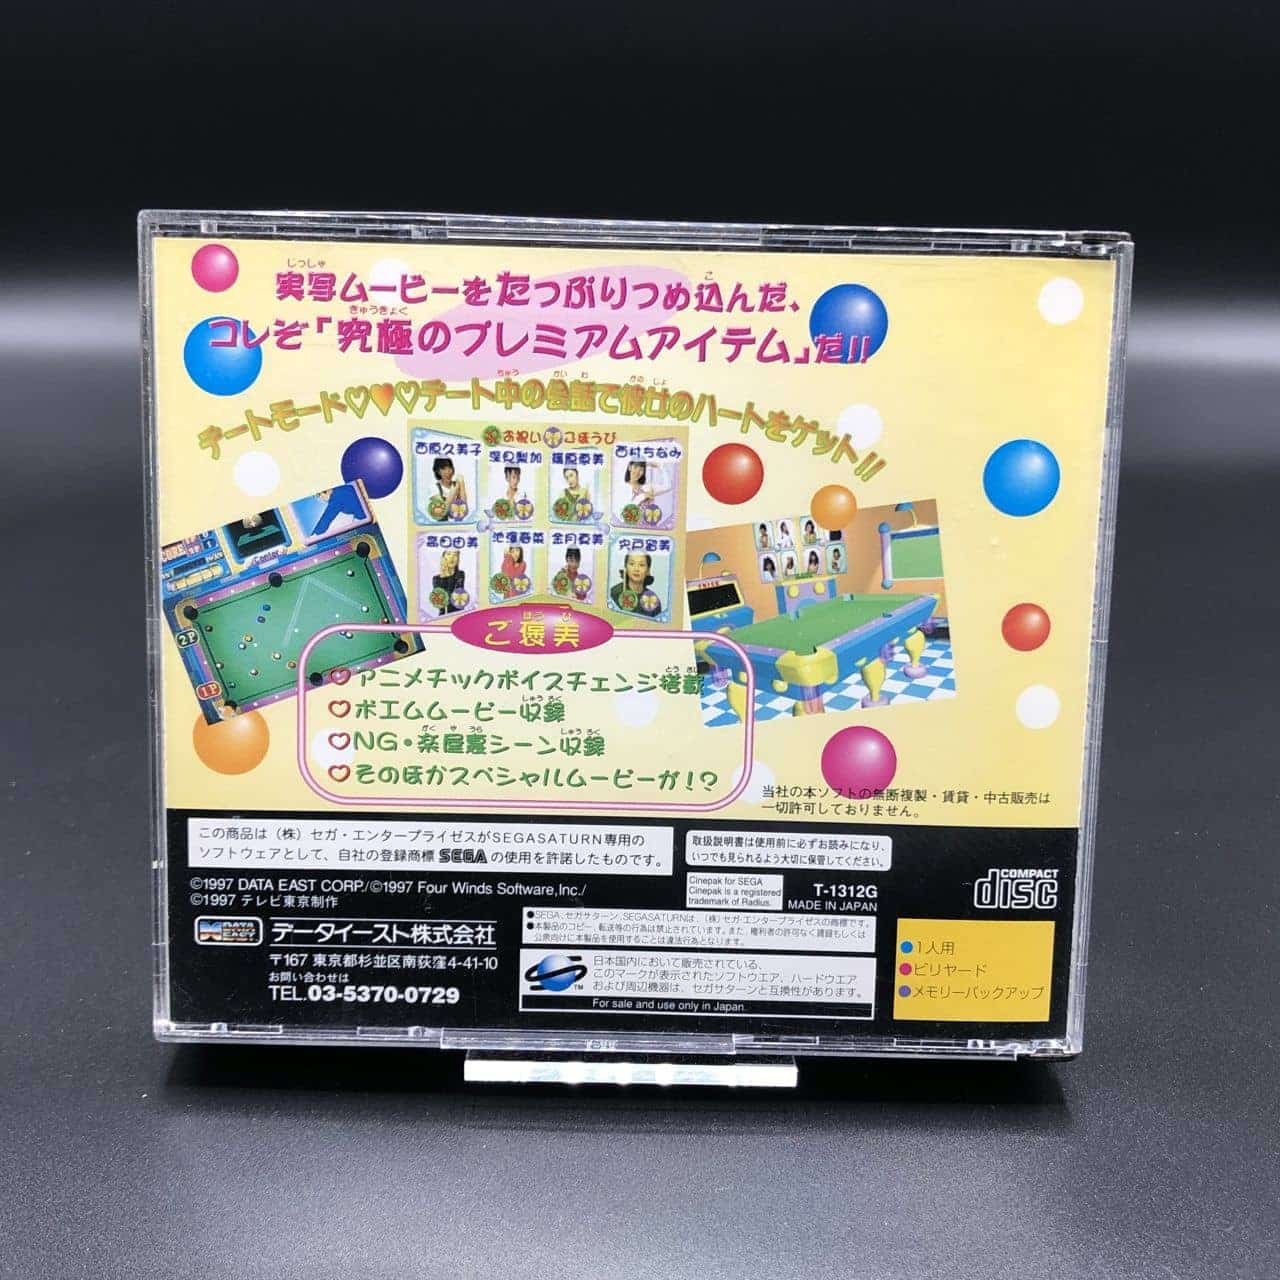 Voice Idol Maniacs - Pool Bar Story (Import) (Komplett) (Sehr gut) Sega Saturn